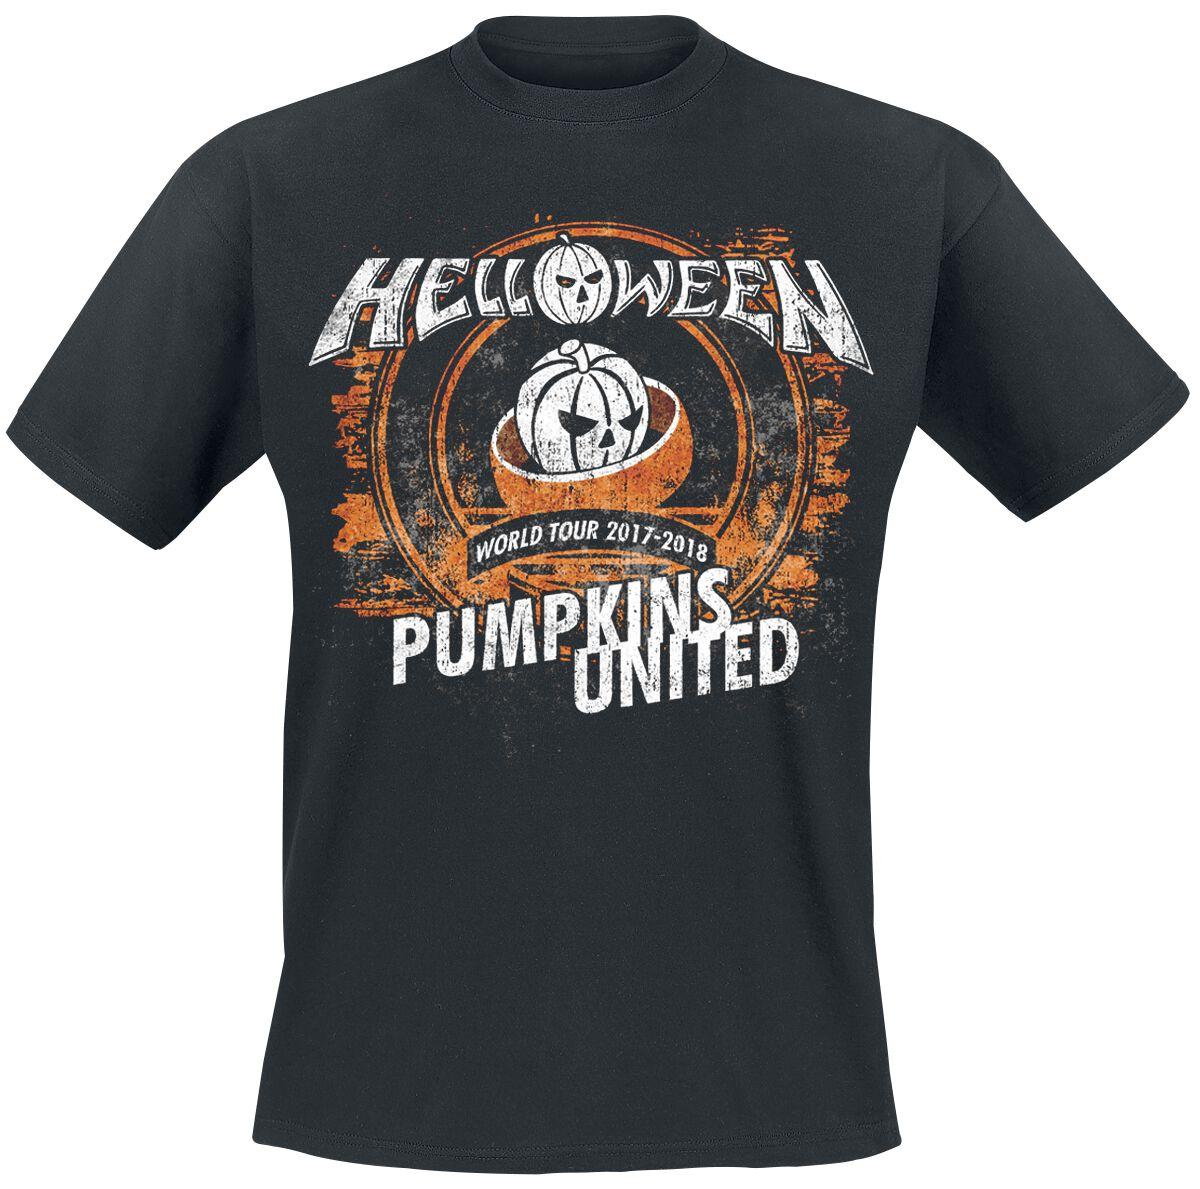 Zespoły - Koszulki - T-Shirt Helloween Tour Rings T-Shirt czarny - 373317